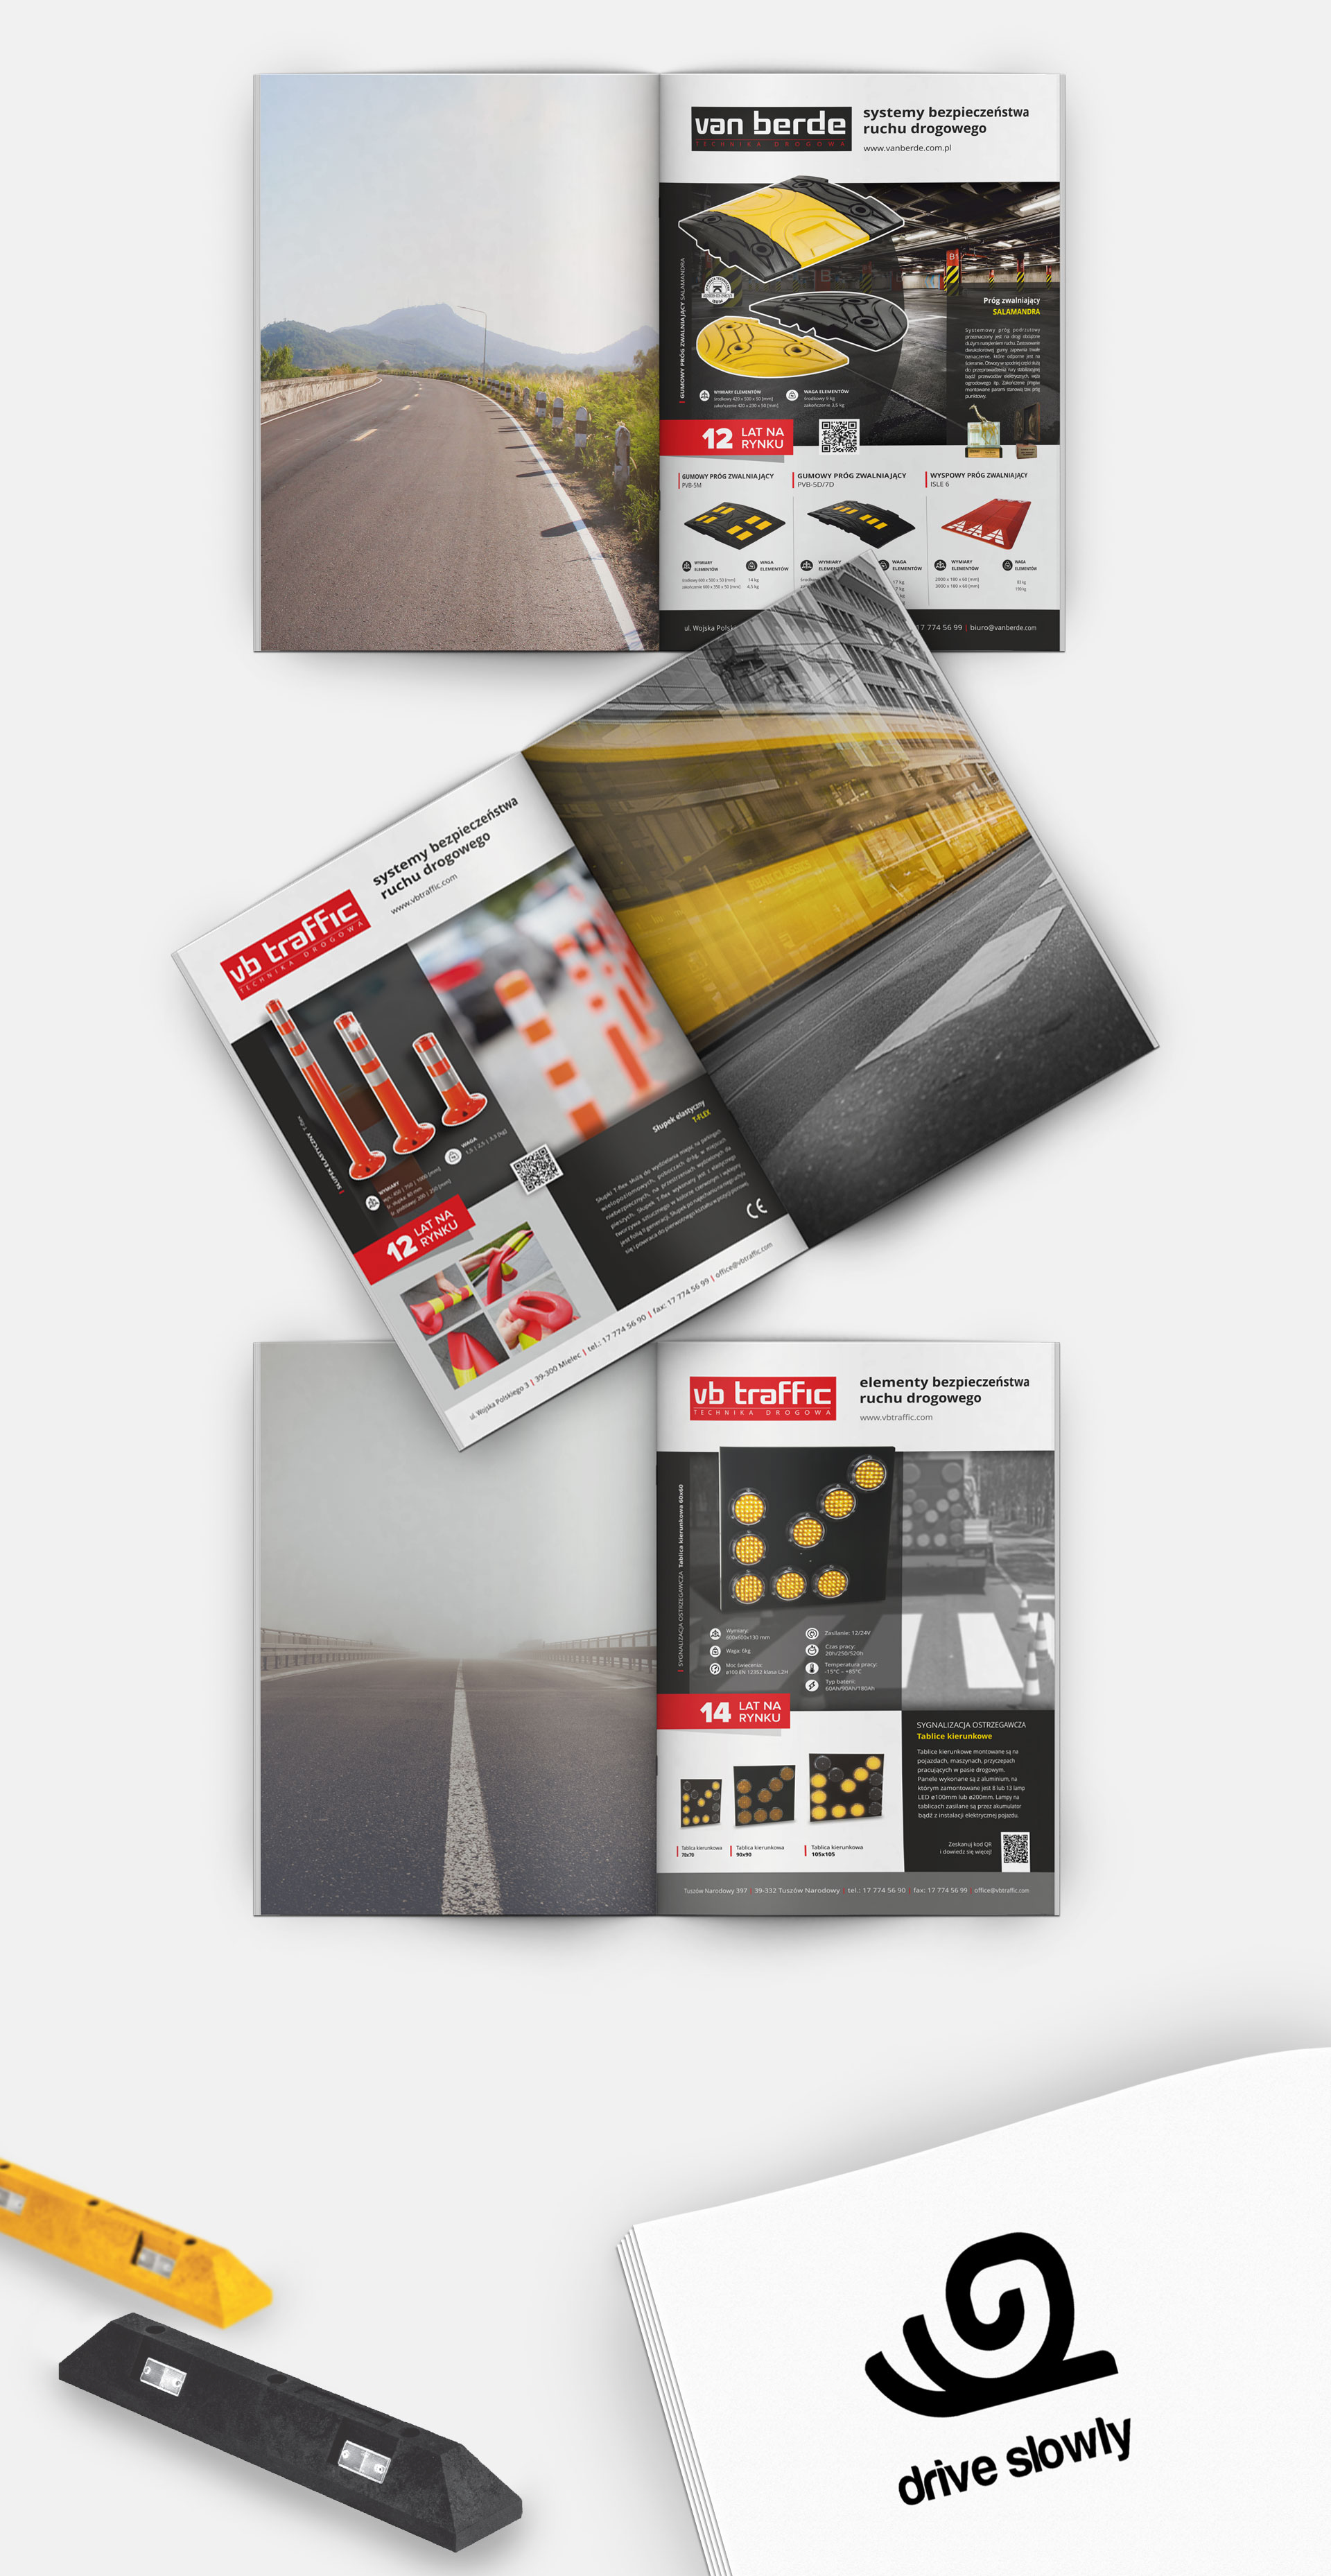 Van Berde - Realizacja - Agencja ROXART